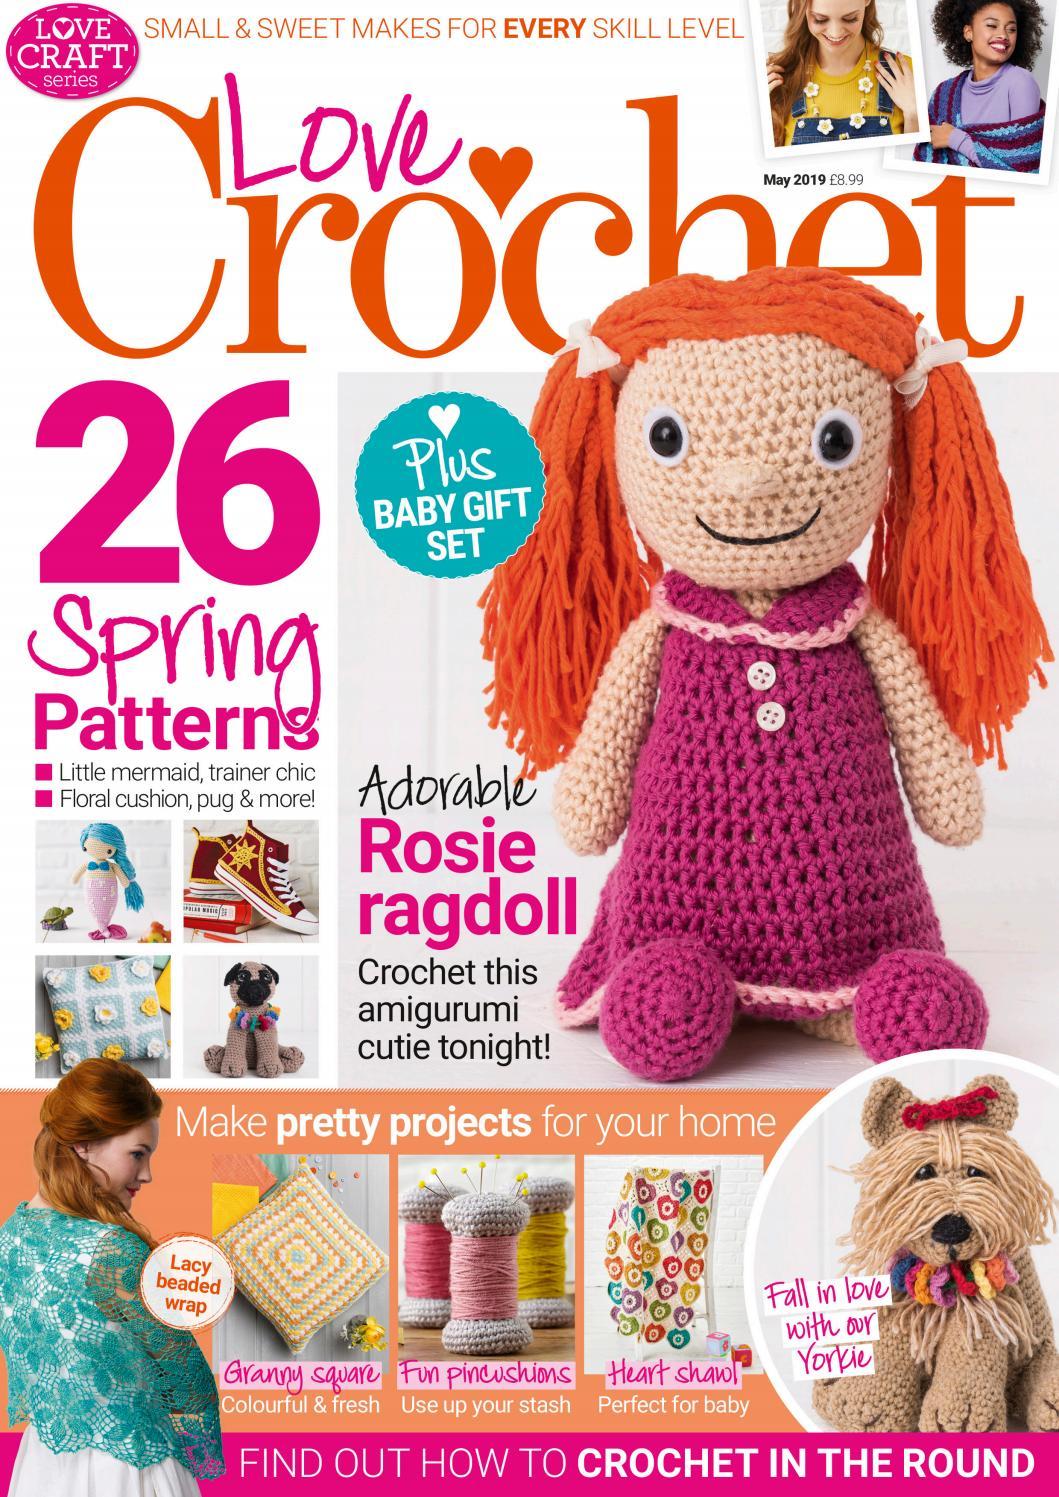 Amigurumi Elephant Nina Free Crochet Pattern in 2020 | Crochet ... | 1497x1059